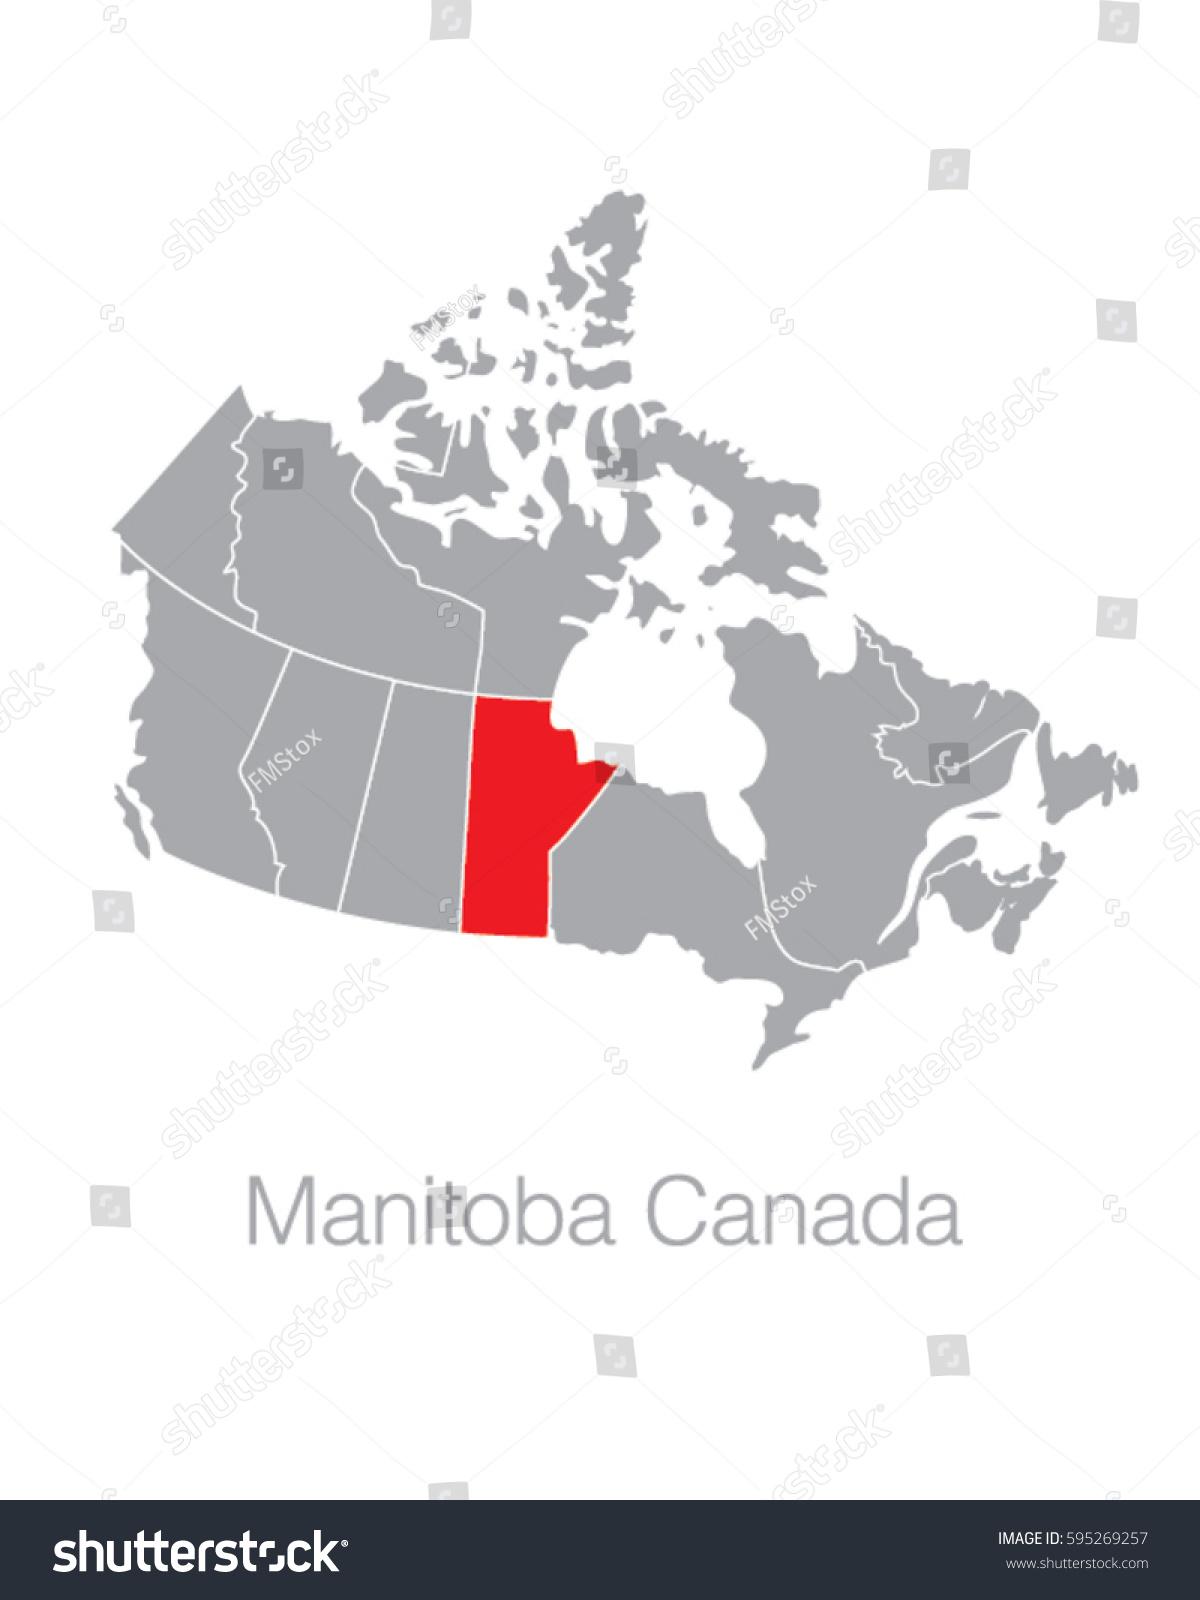 vector map canada highlighting province manitoba stock vector 595269257 shutterstock